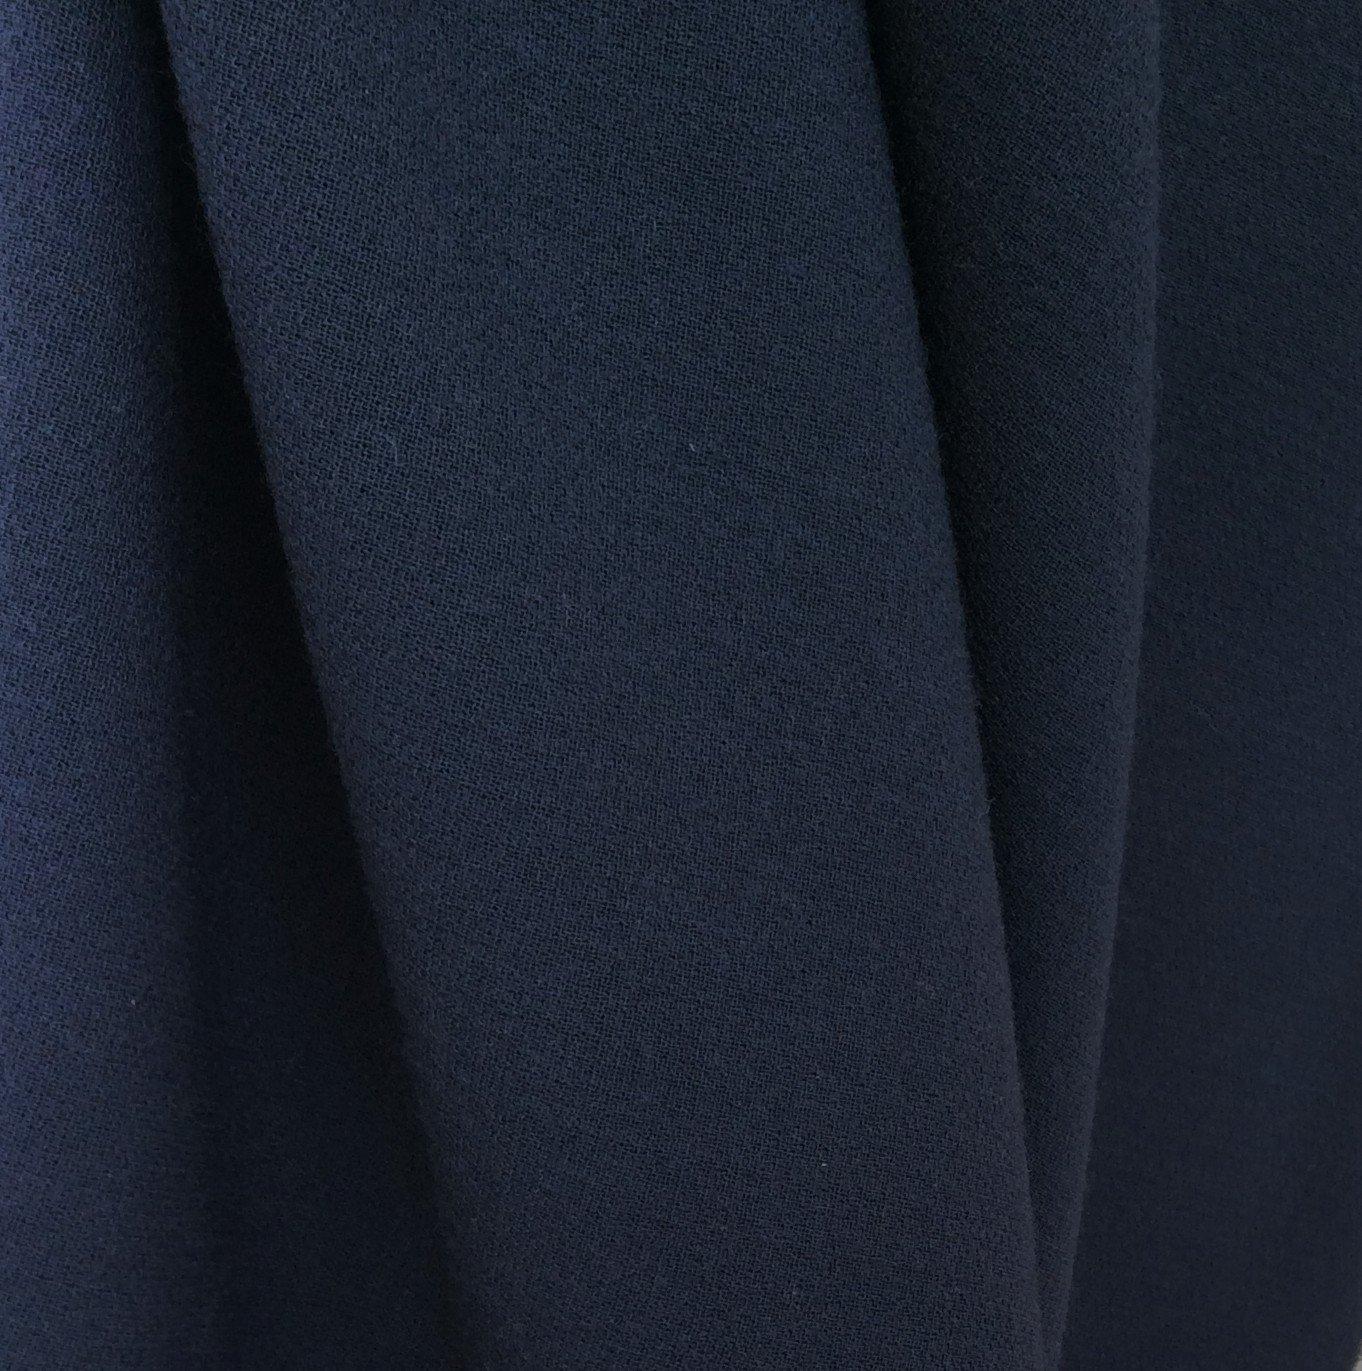 tissu crepe de laine marine fonce